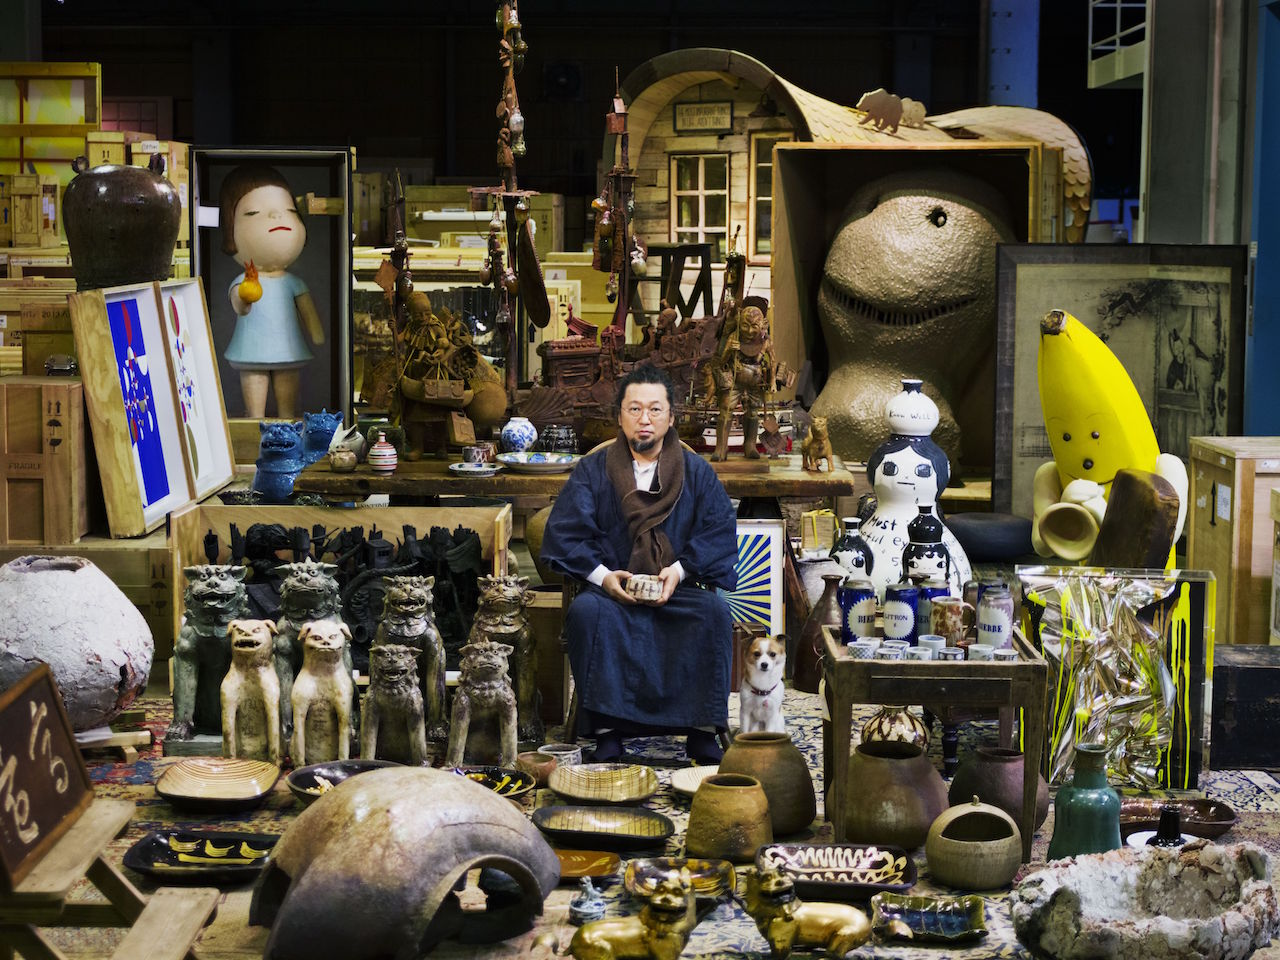 Takashi Murakami and his Superflat Collection (photo by Kentaro Hirao, all images courtesy Yokohama Museum of Art)